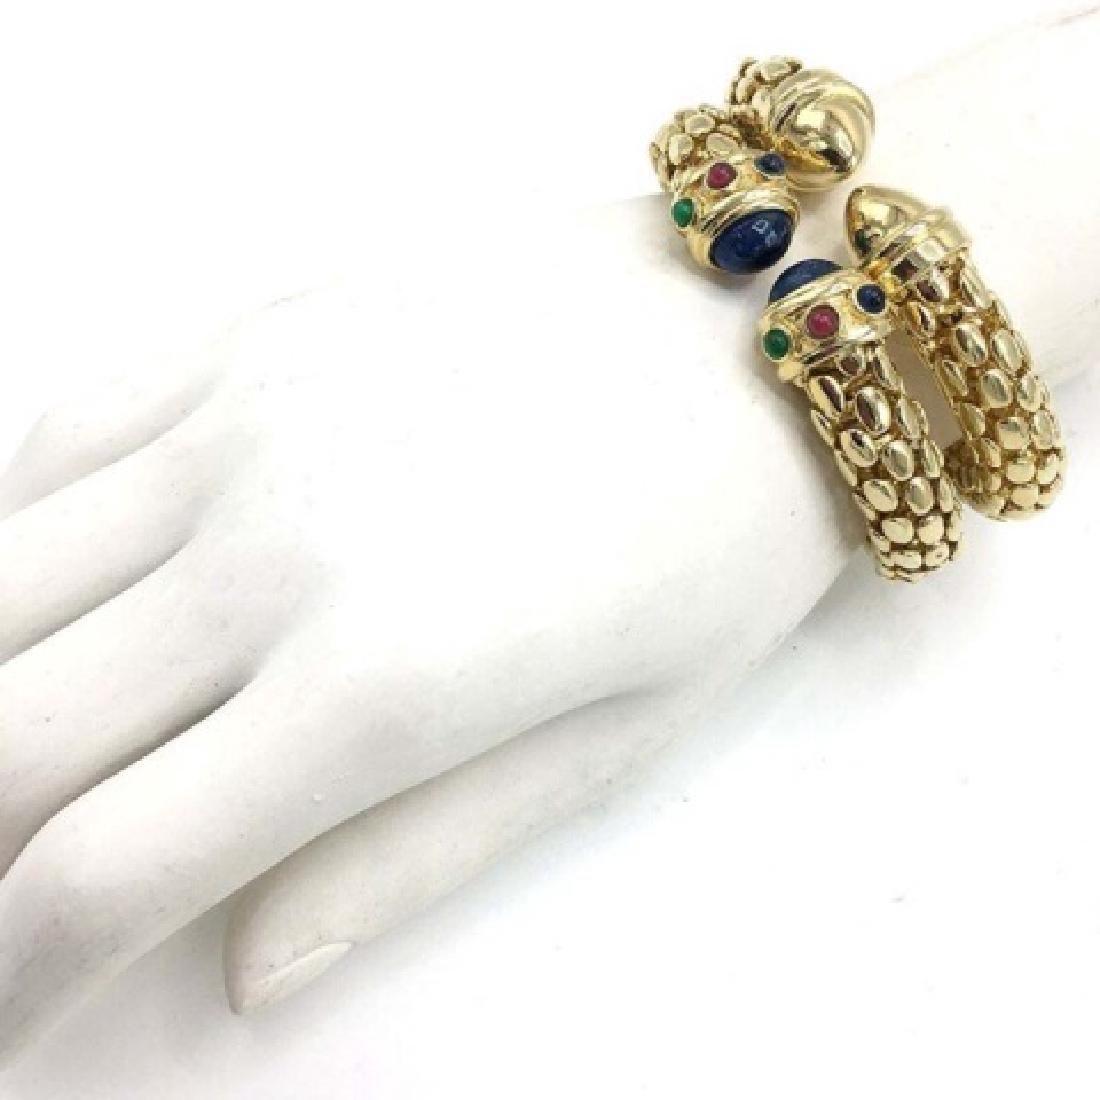 Pair of Costume Cuff Bracelets w/ Faux Gems - 2